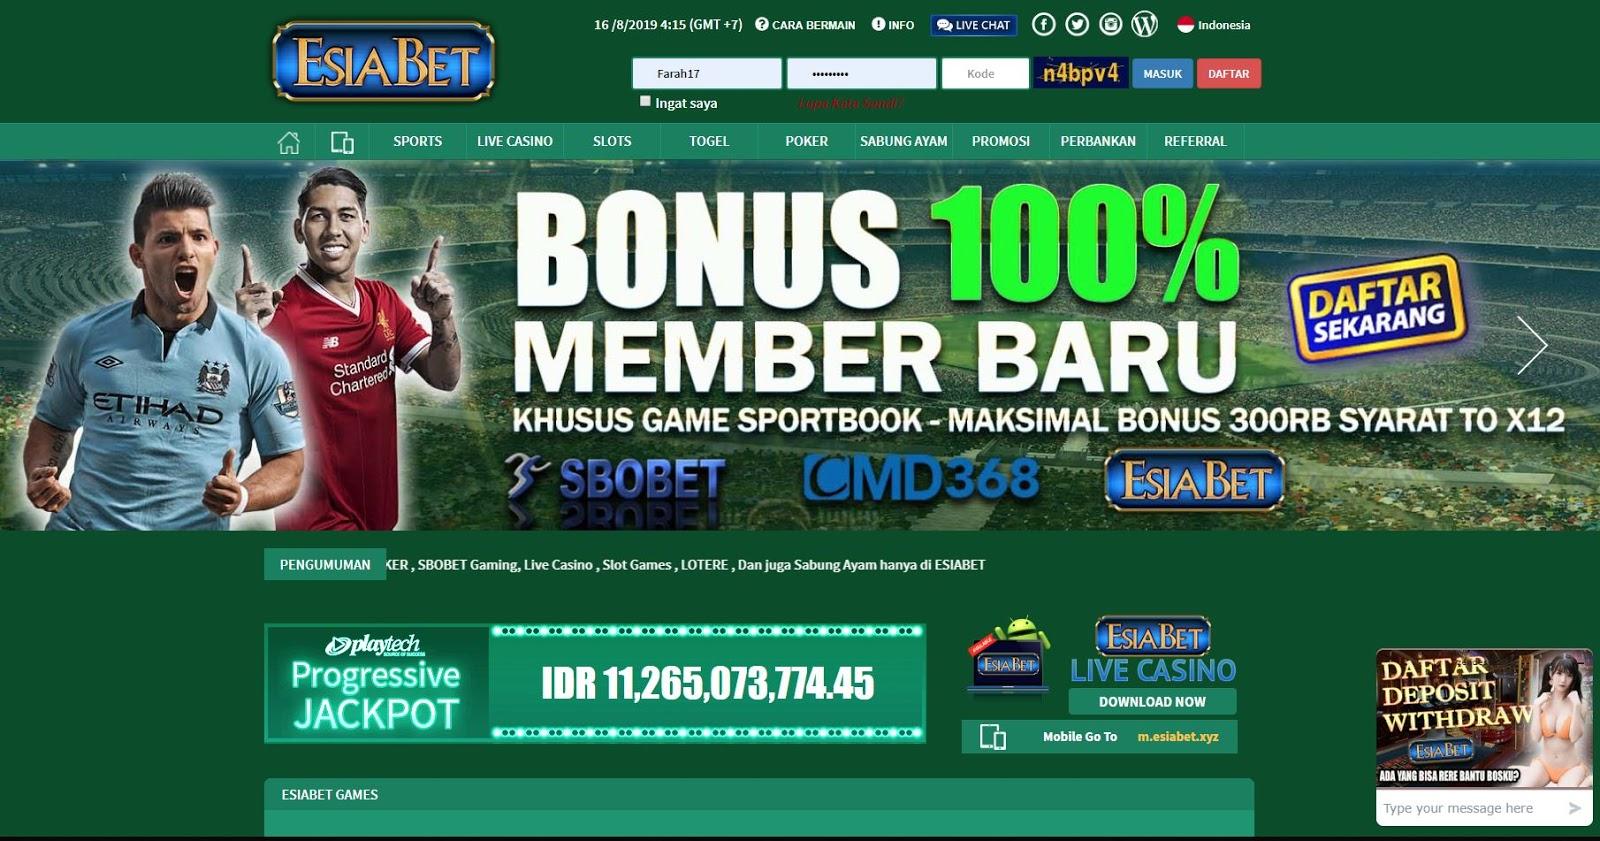 Bonus Deposit Bola Online 100 Bersama Agen Judi Esiabet